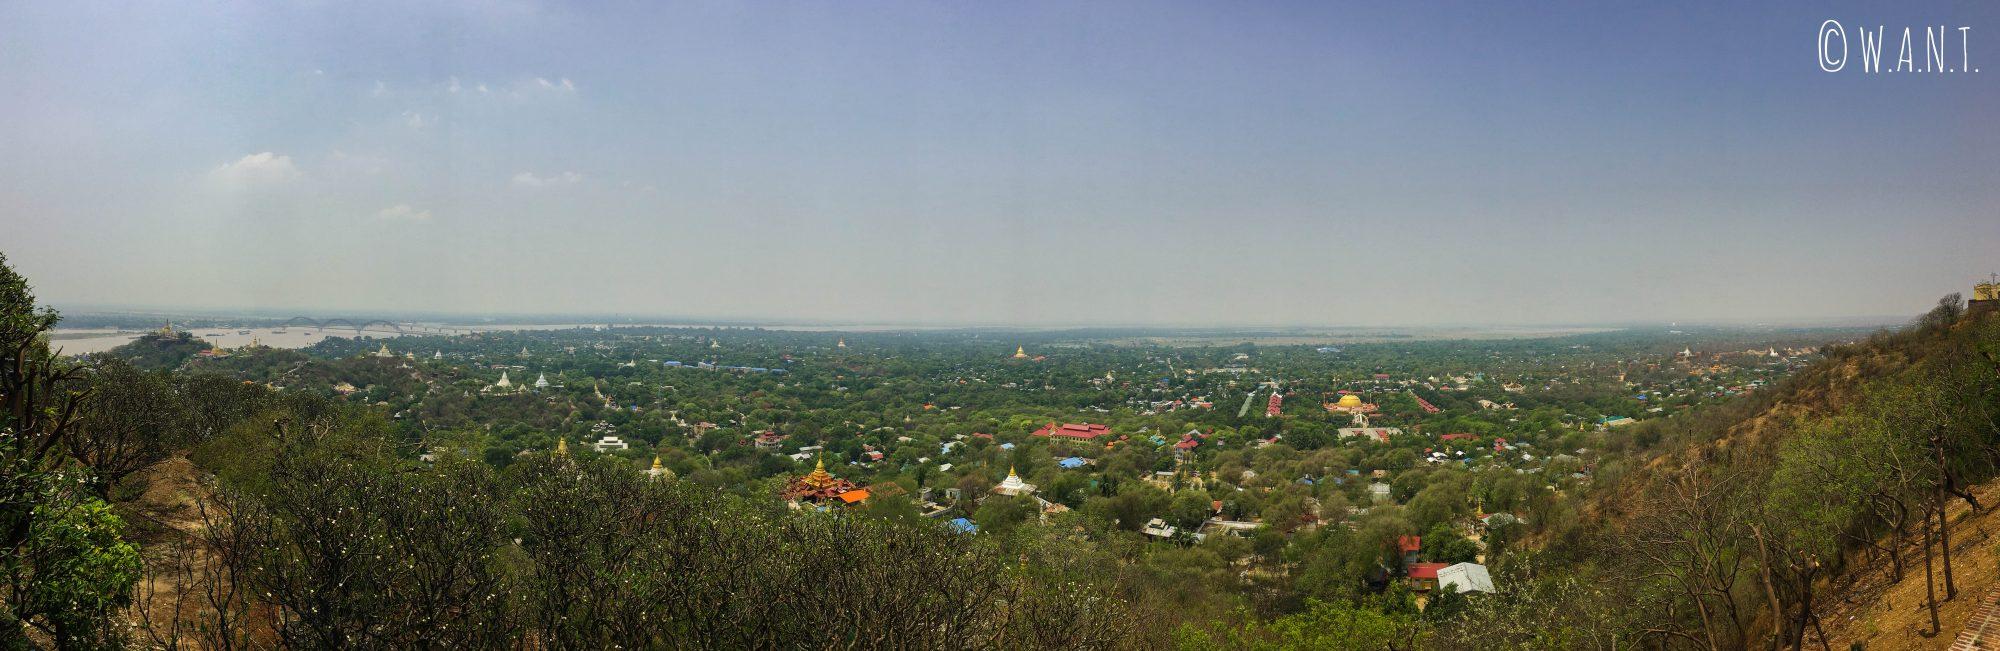 Panorama sur Sagaing depuis la pagode Soon U Ponya Shin